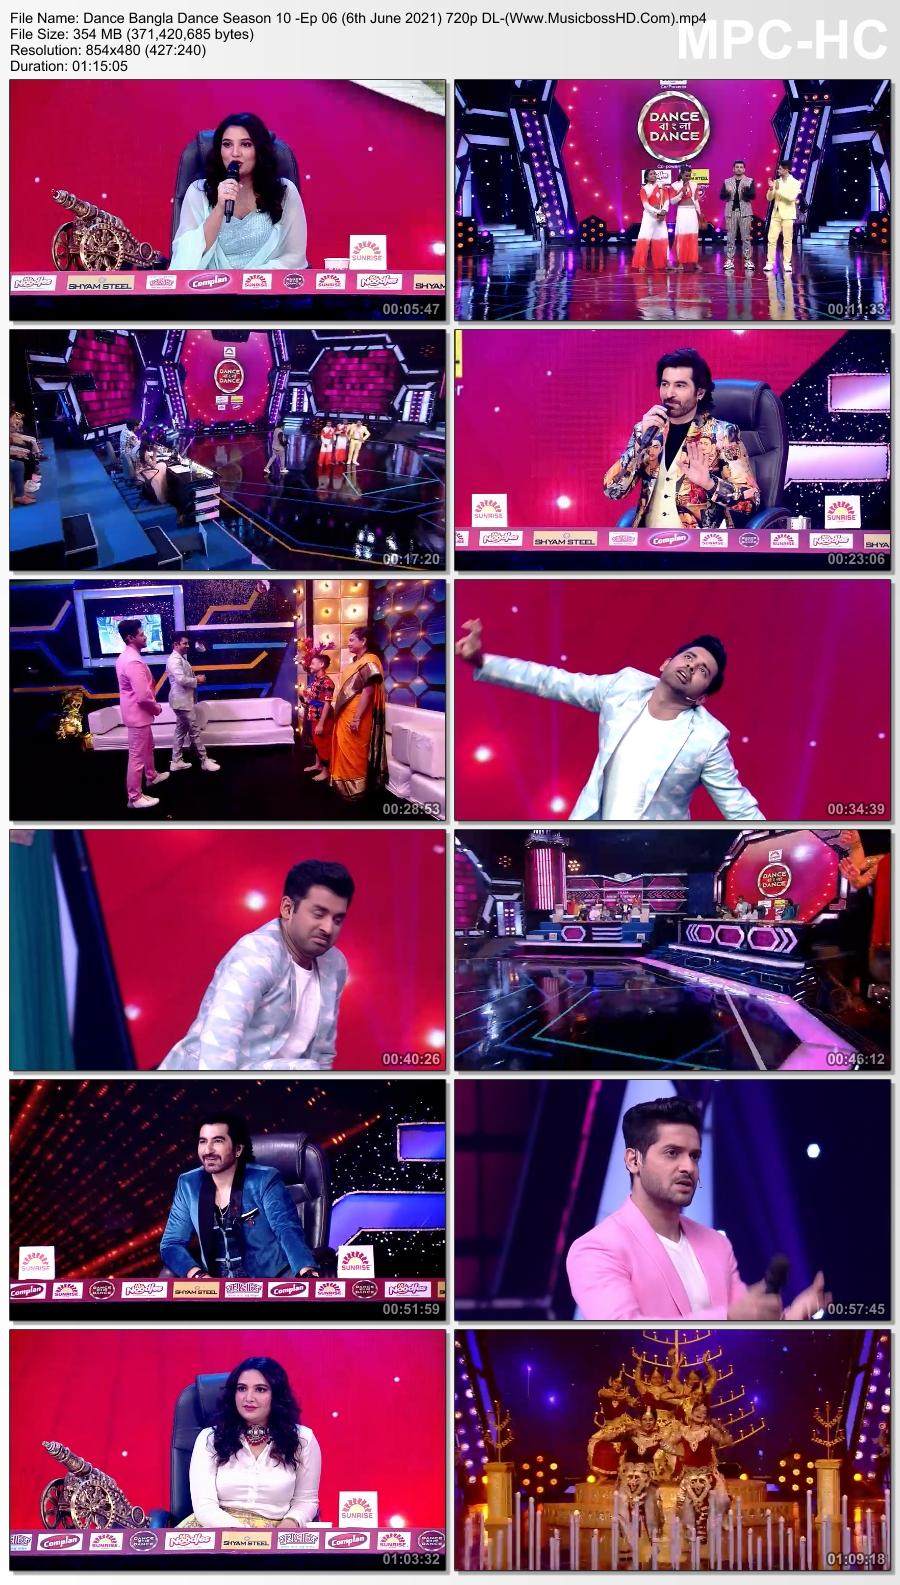 Dance-Bangla-Dance-Season-10-Ep-06-6th-June-2021-720p-DL-Www-Musicboss-HD-Com-mp4-thumbs-2021-06-06-